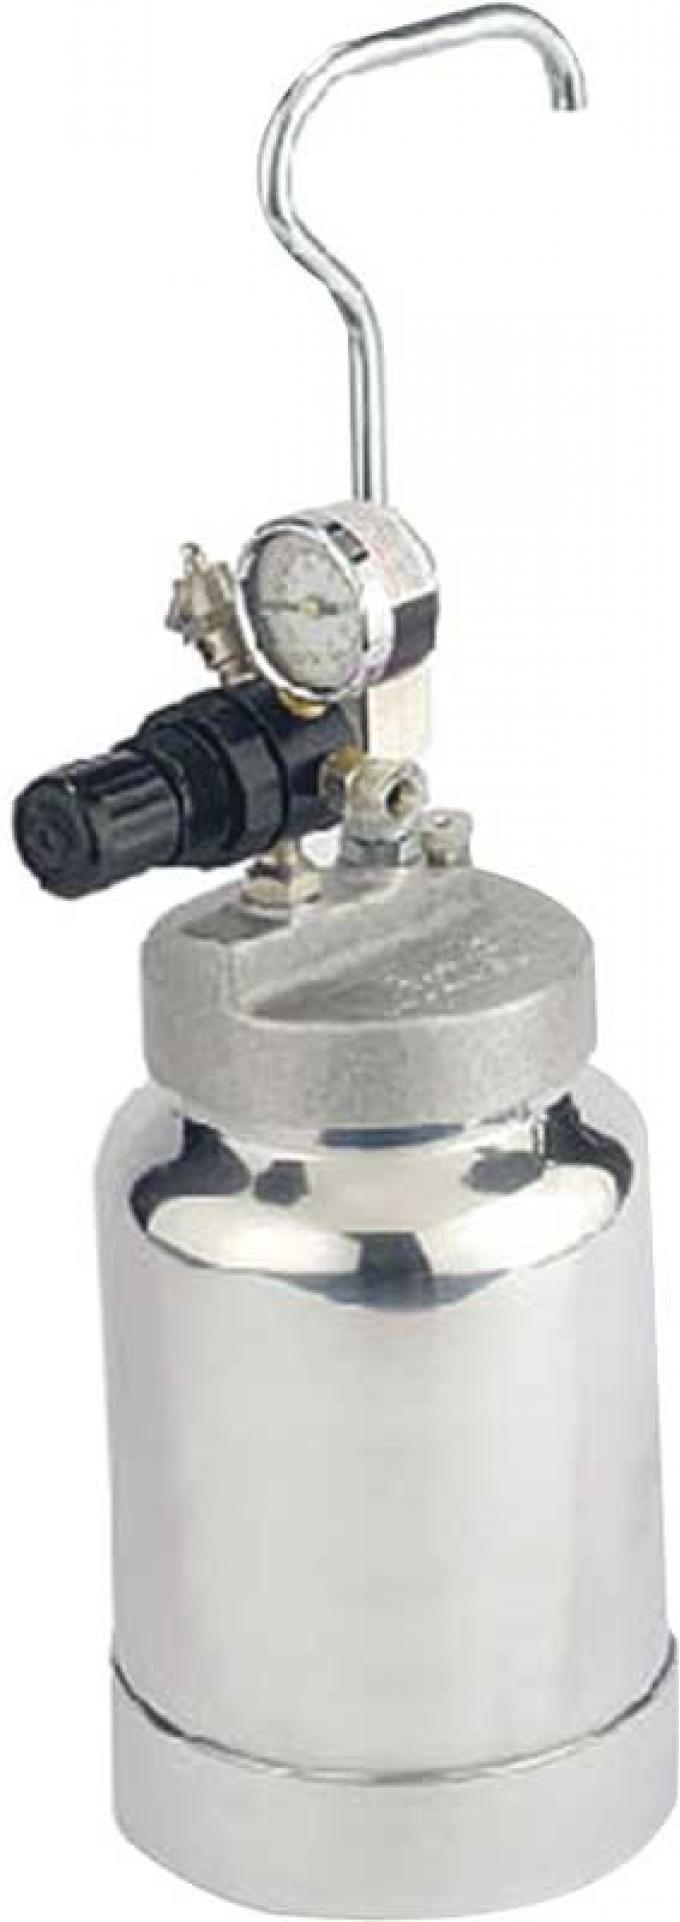 OER Binks 2 Quart Pressure Tank (Used with Binks 2100 Spray Gun) A9250102